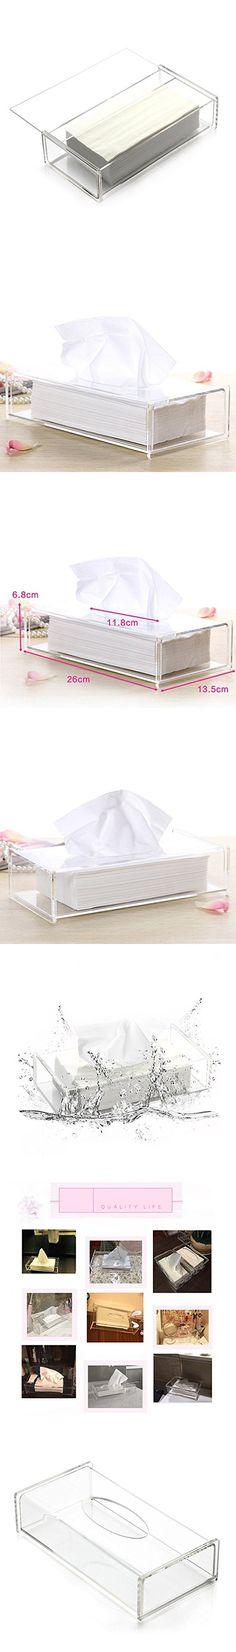 Aoert Acrylic Tissue Dispenser Box Rectangle Clear Tissue Box Cover Decorative Napkin Holder - Bathroom Facial Tissue Holders